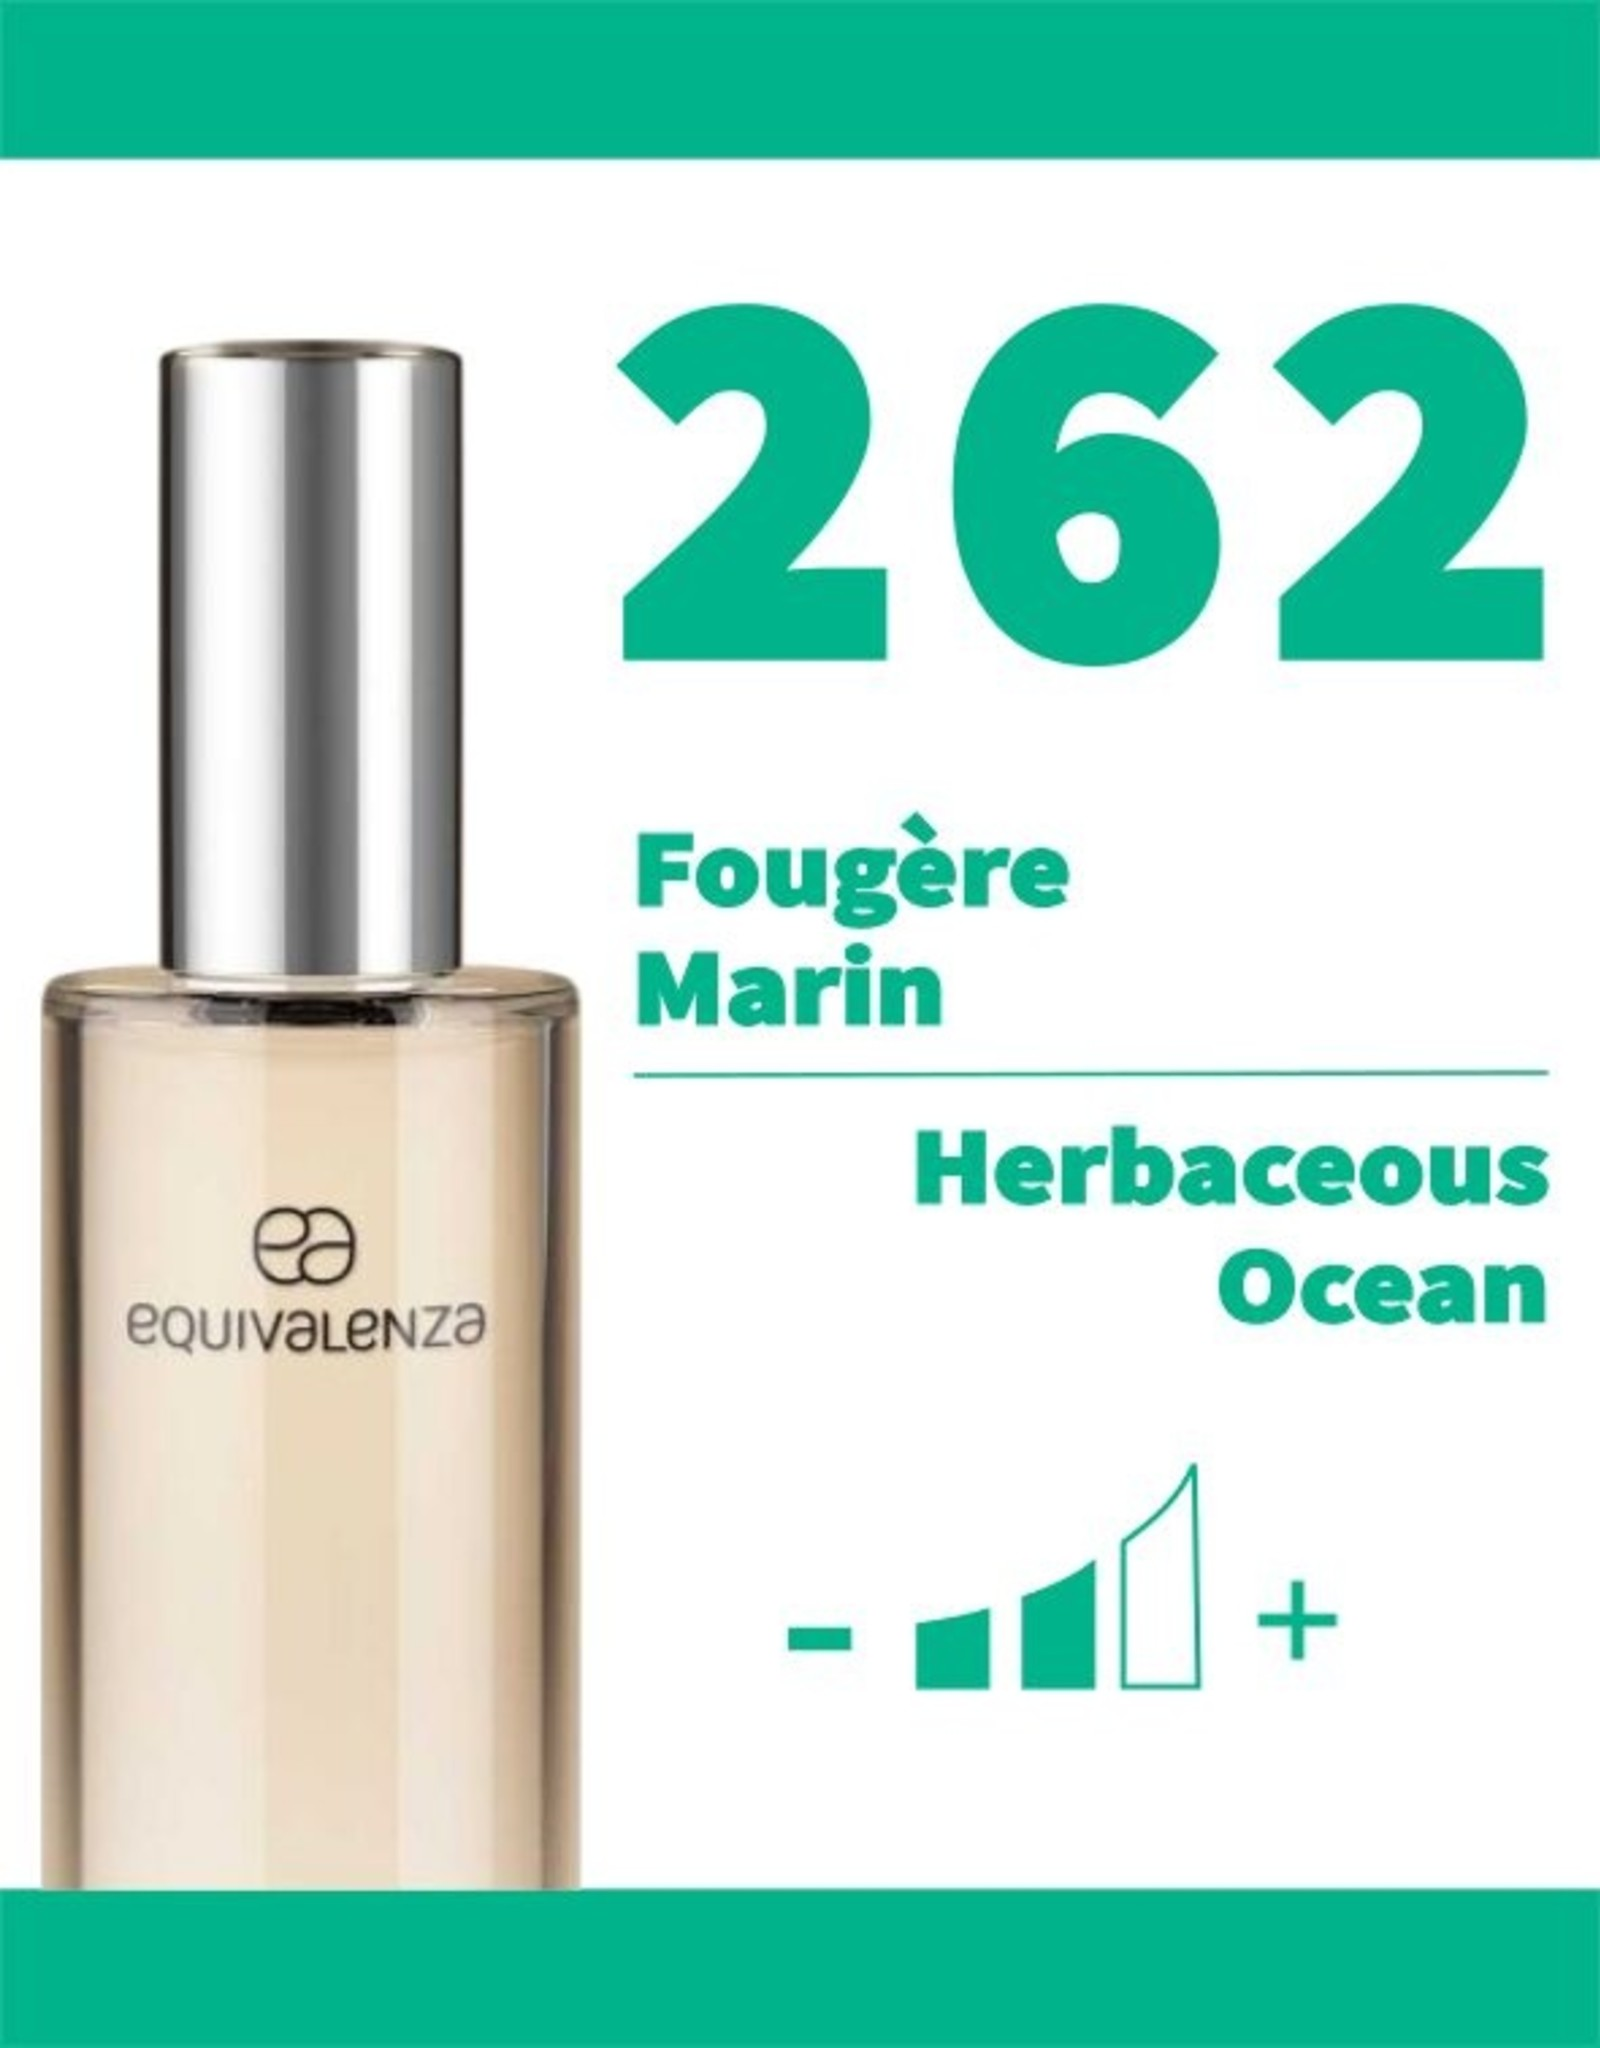 Equivalenza Herbaceous Ocean 262